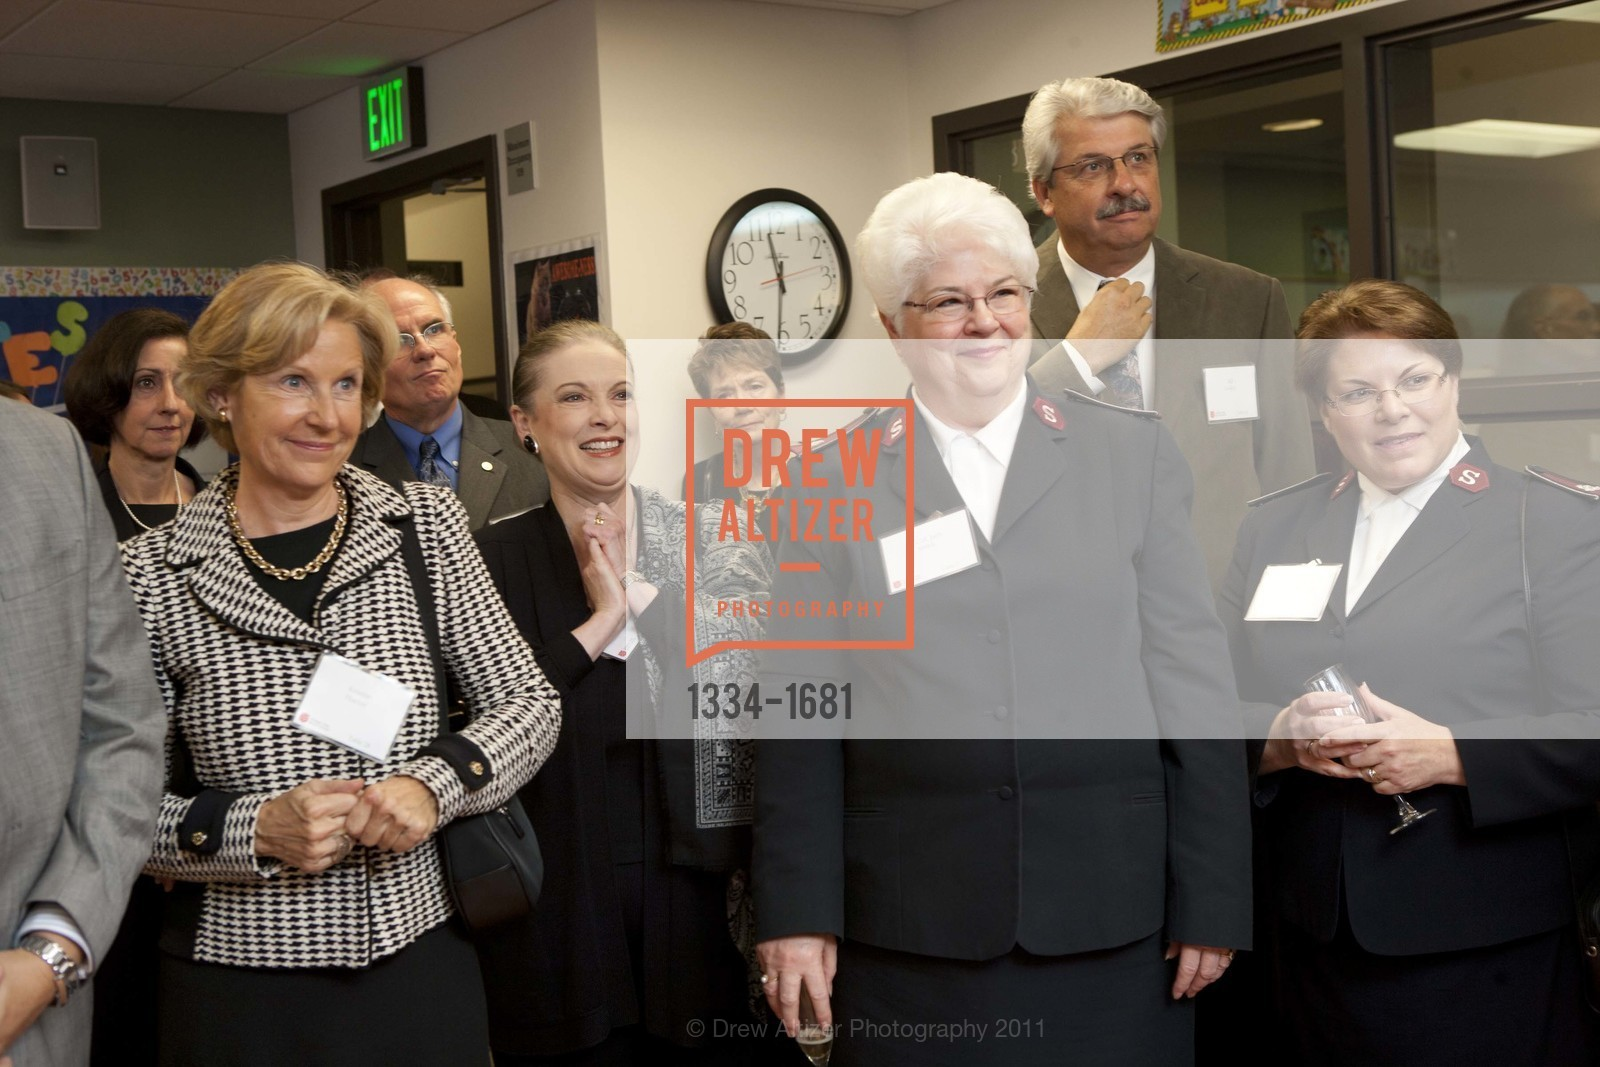 Kristin Hueter, Terry Lowry, Lt. Col Judy Smith, Marcia Smith, Photo #1334-1681